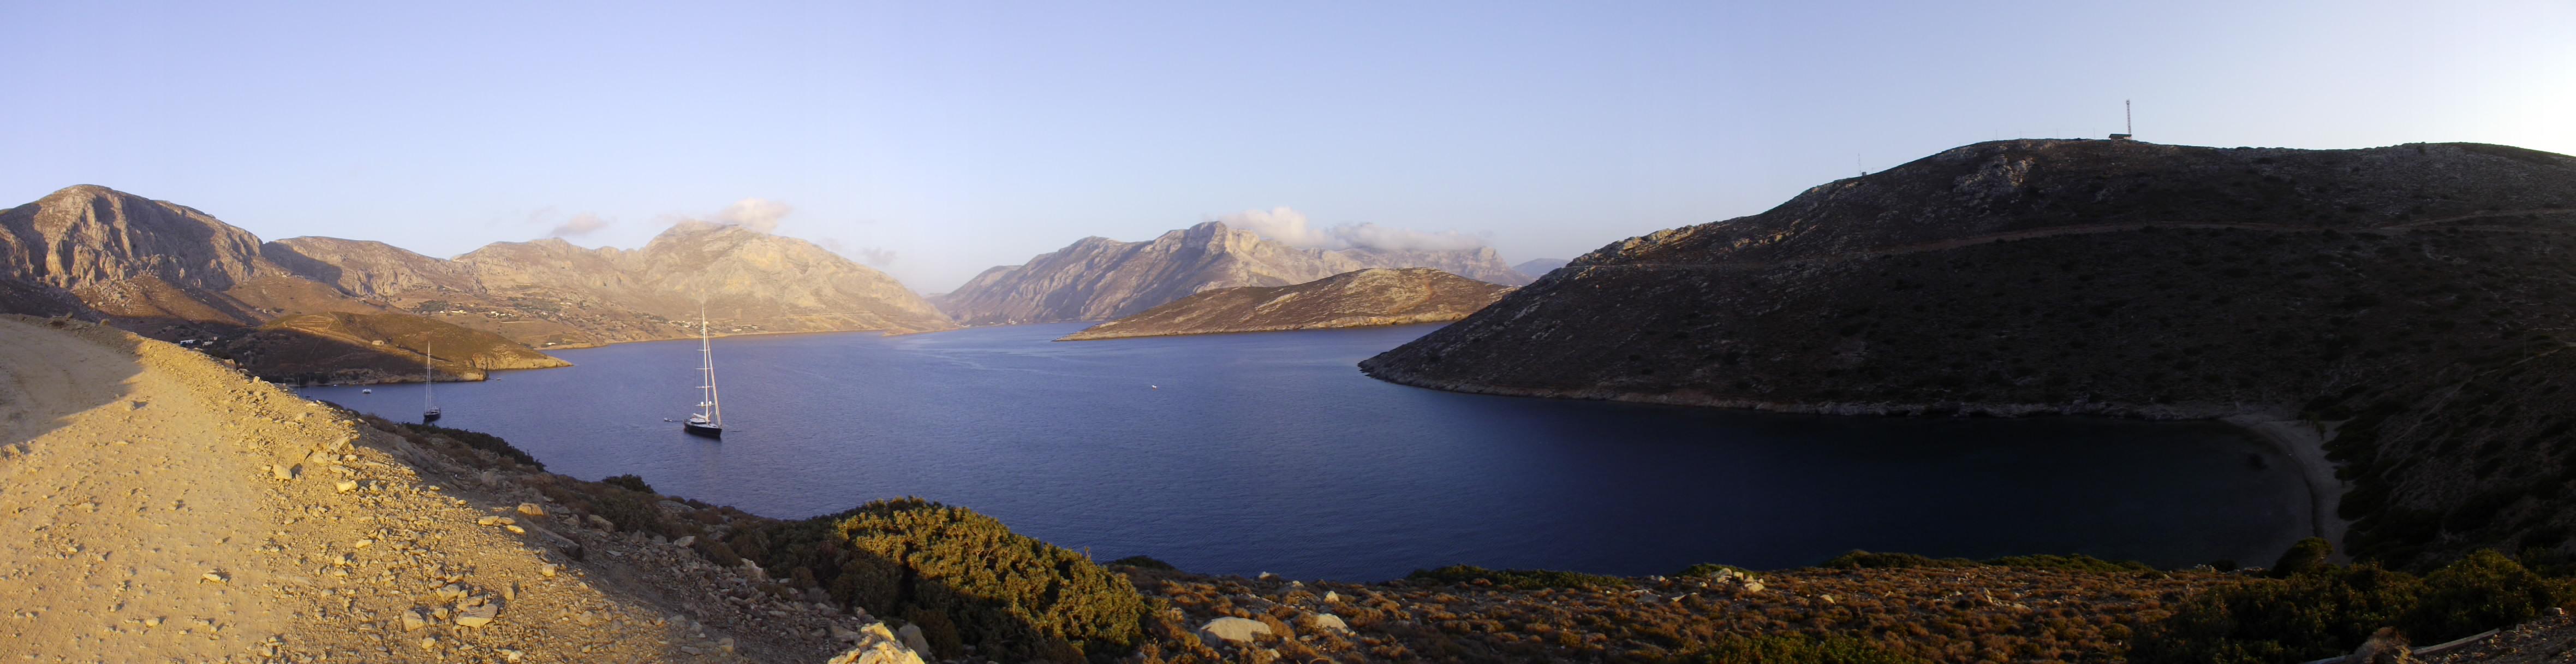 Kalymnos nord, dall'alto